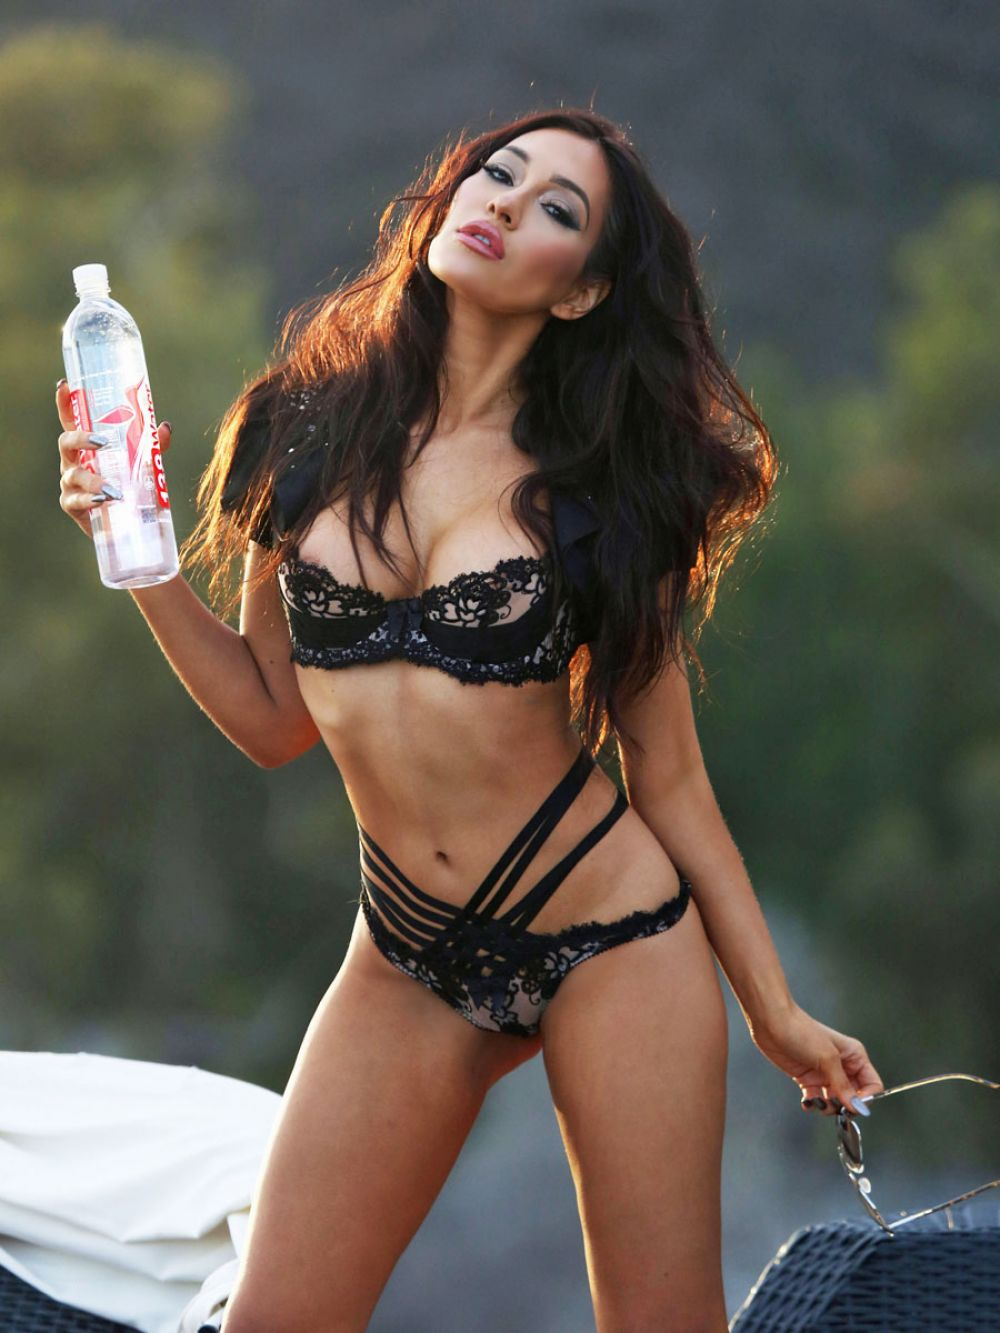 KEA HO in Bikini at 138 Water Photoshoot in Malibu